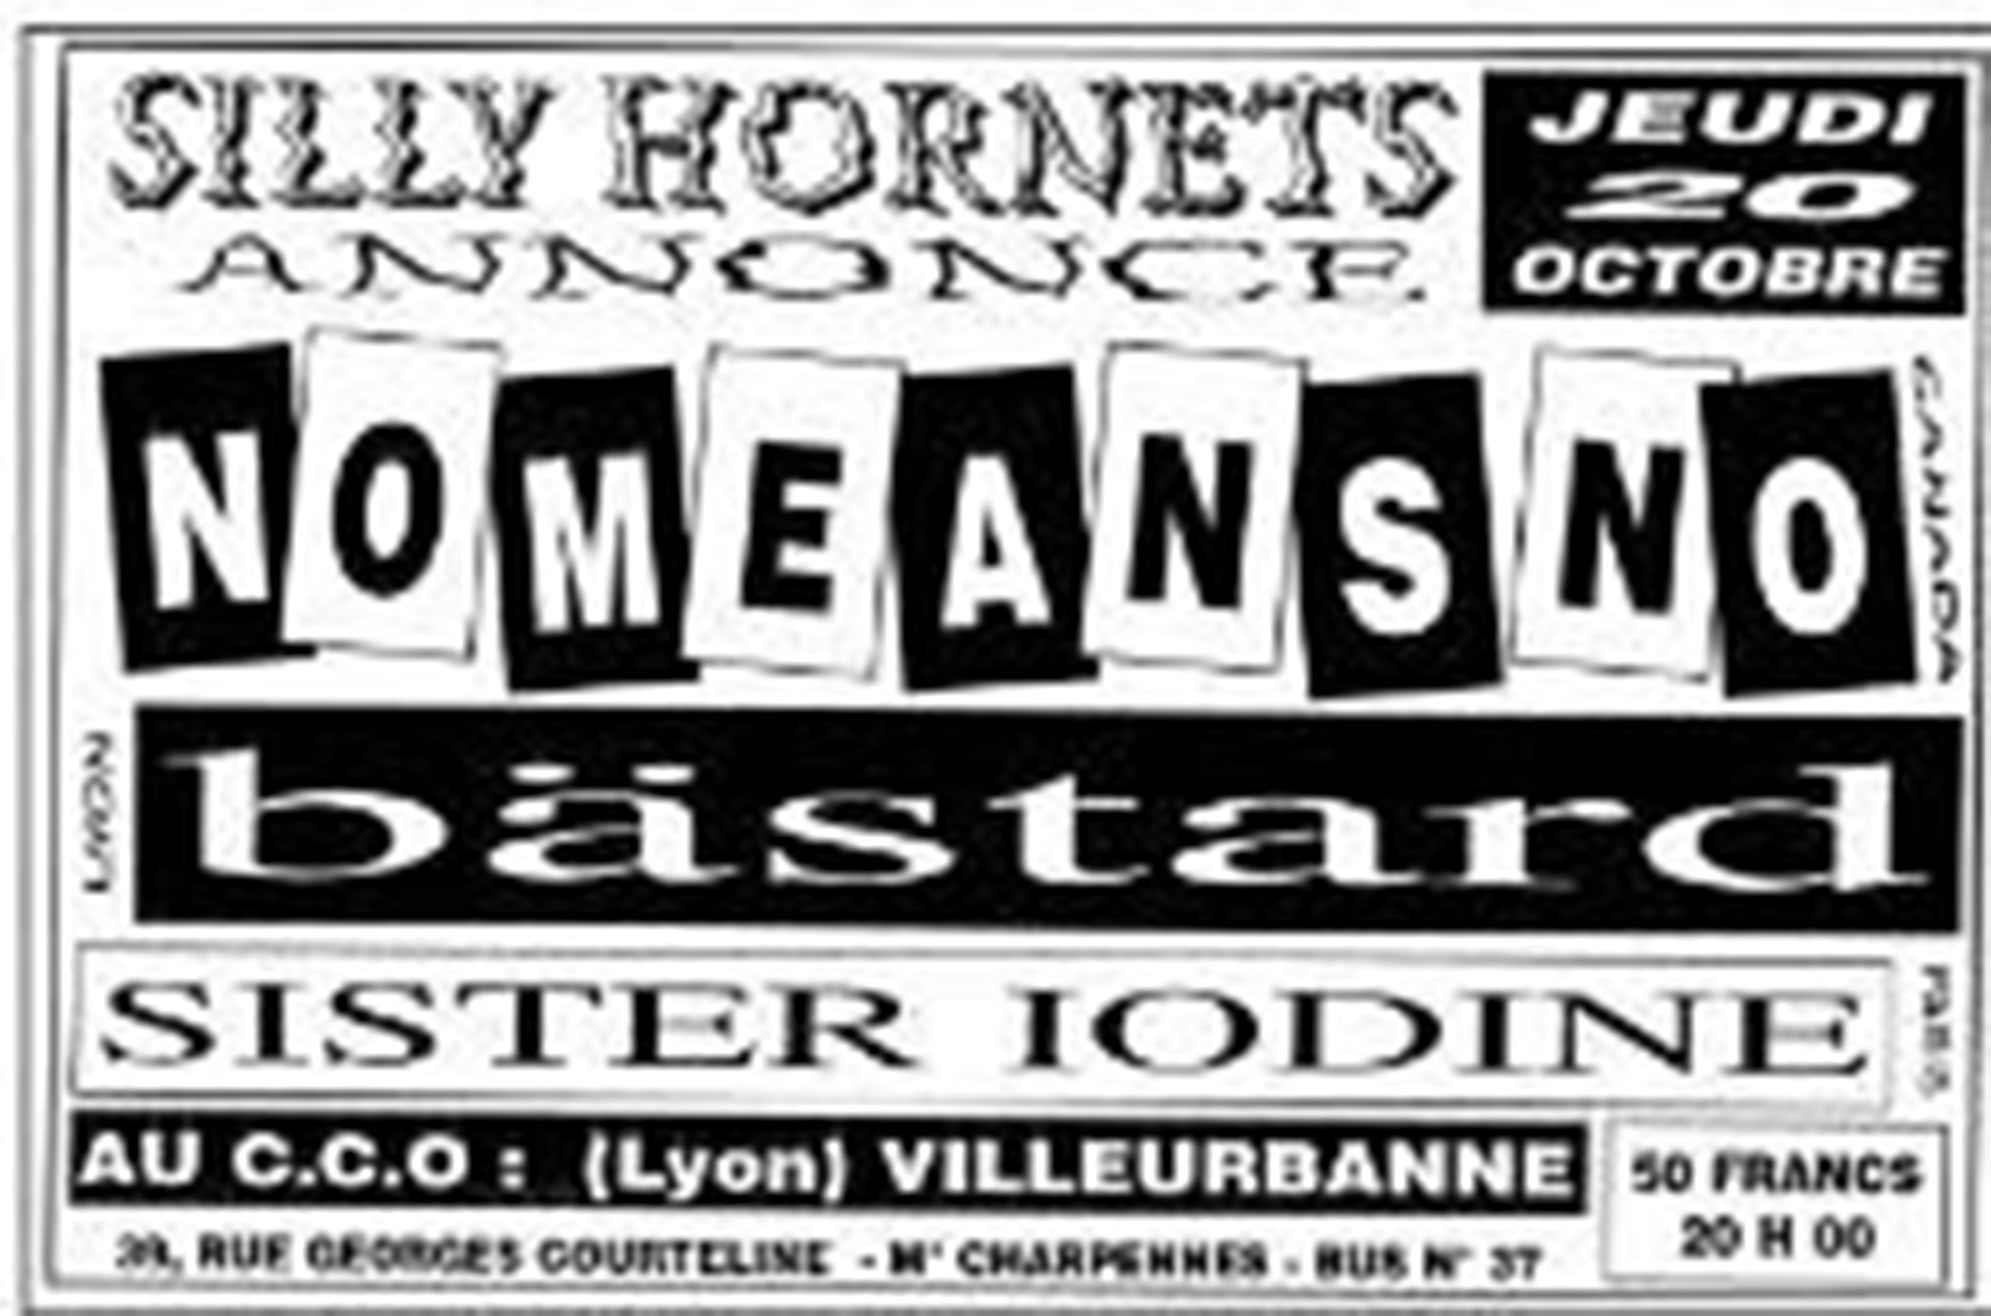 "20 Octobre 1995 NoMeansNo, Sister Iodine, Bastard à Villeurbanne ""CCO"""